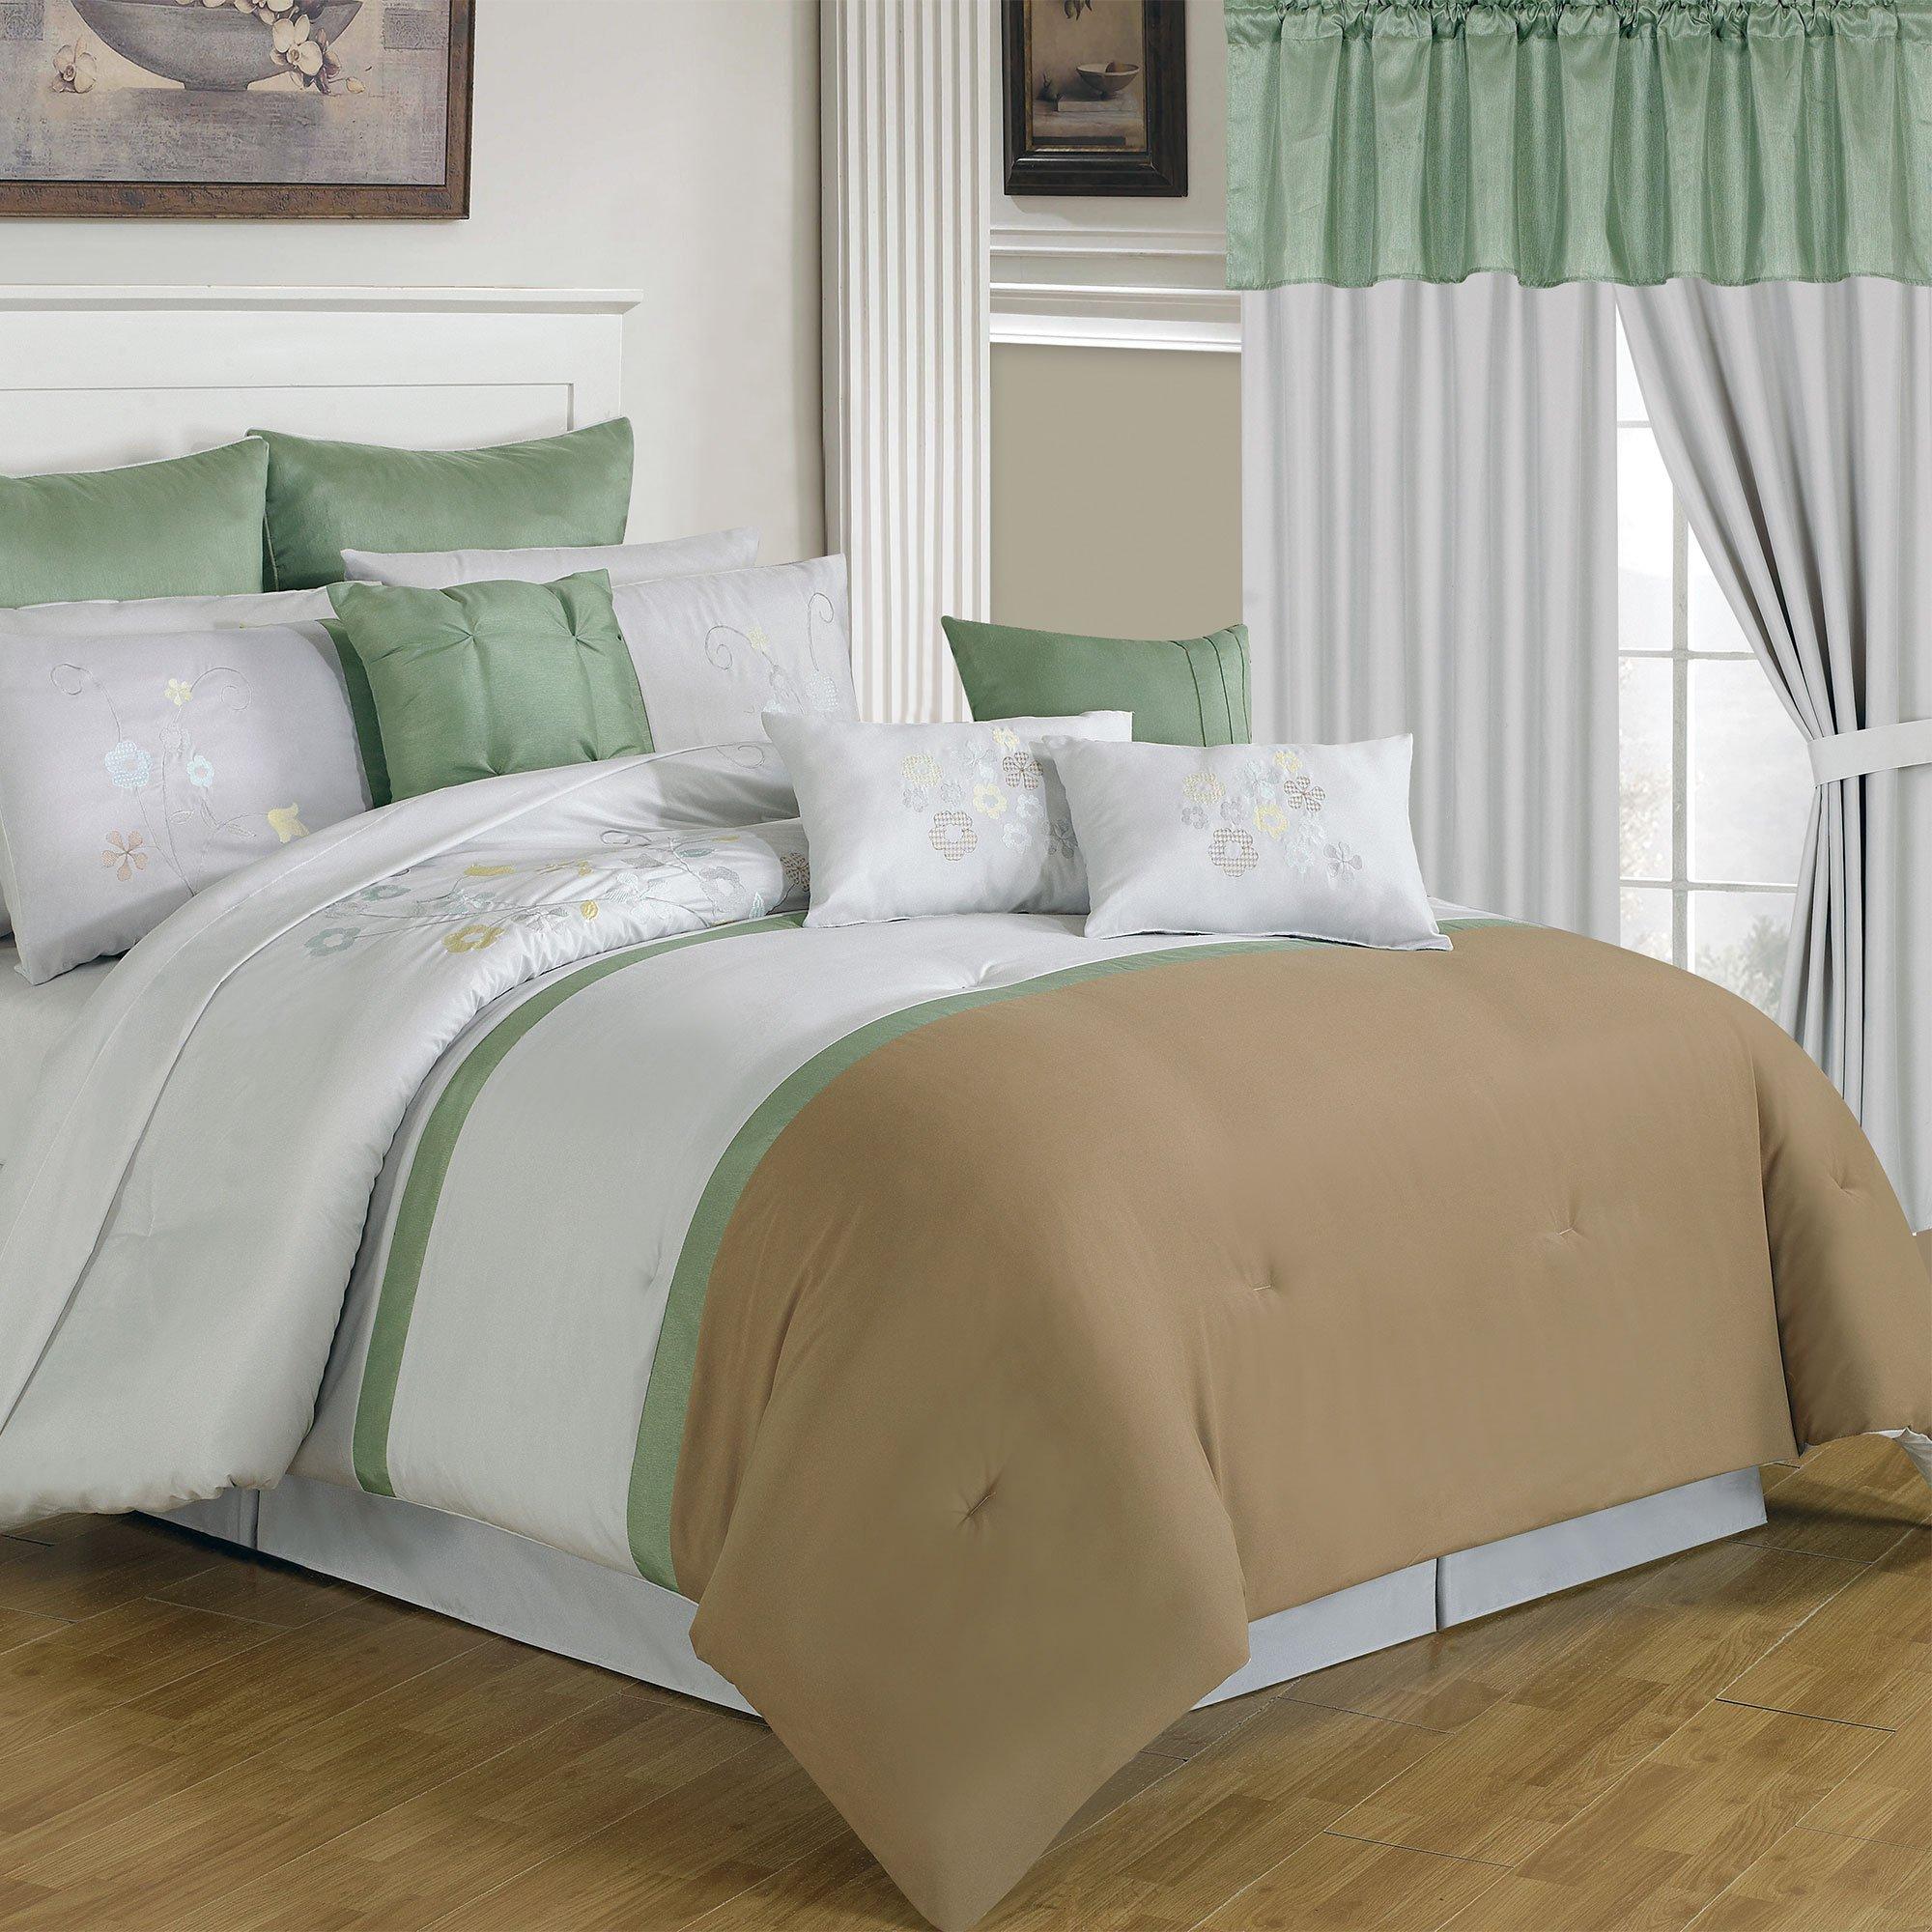 Lavish Home 66-00007-24pc-Q 24-Piece Room-in-a-Bag Elizabeth Bedroom Set, Queen